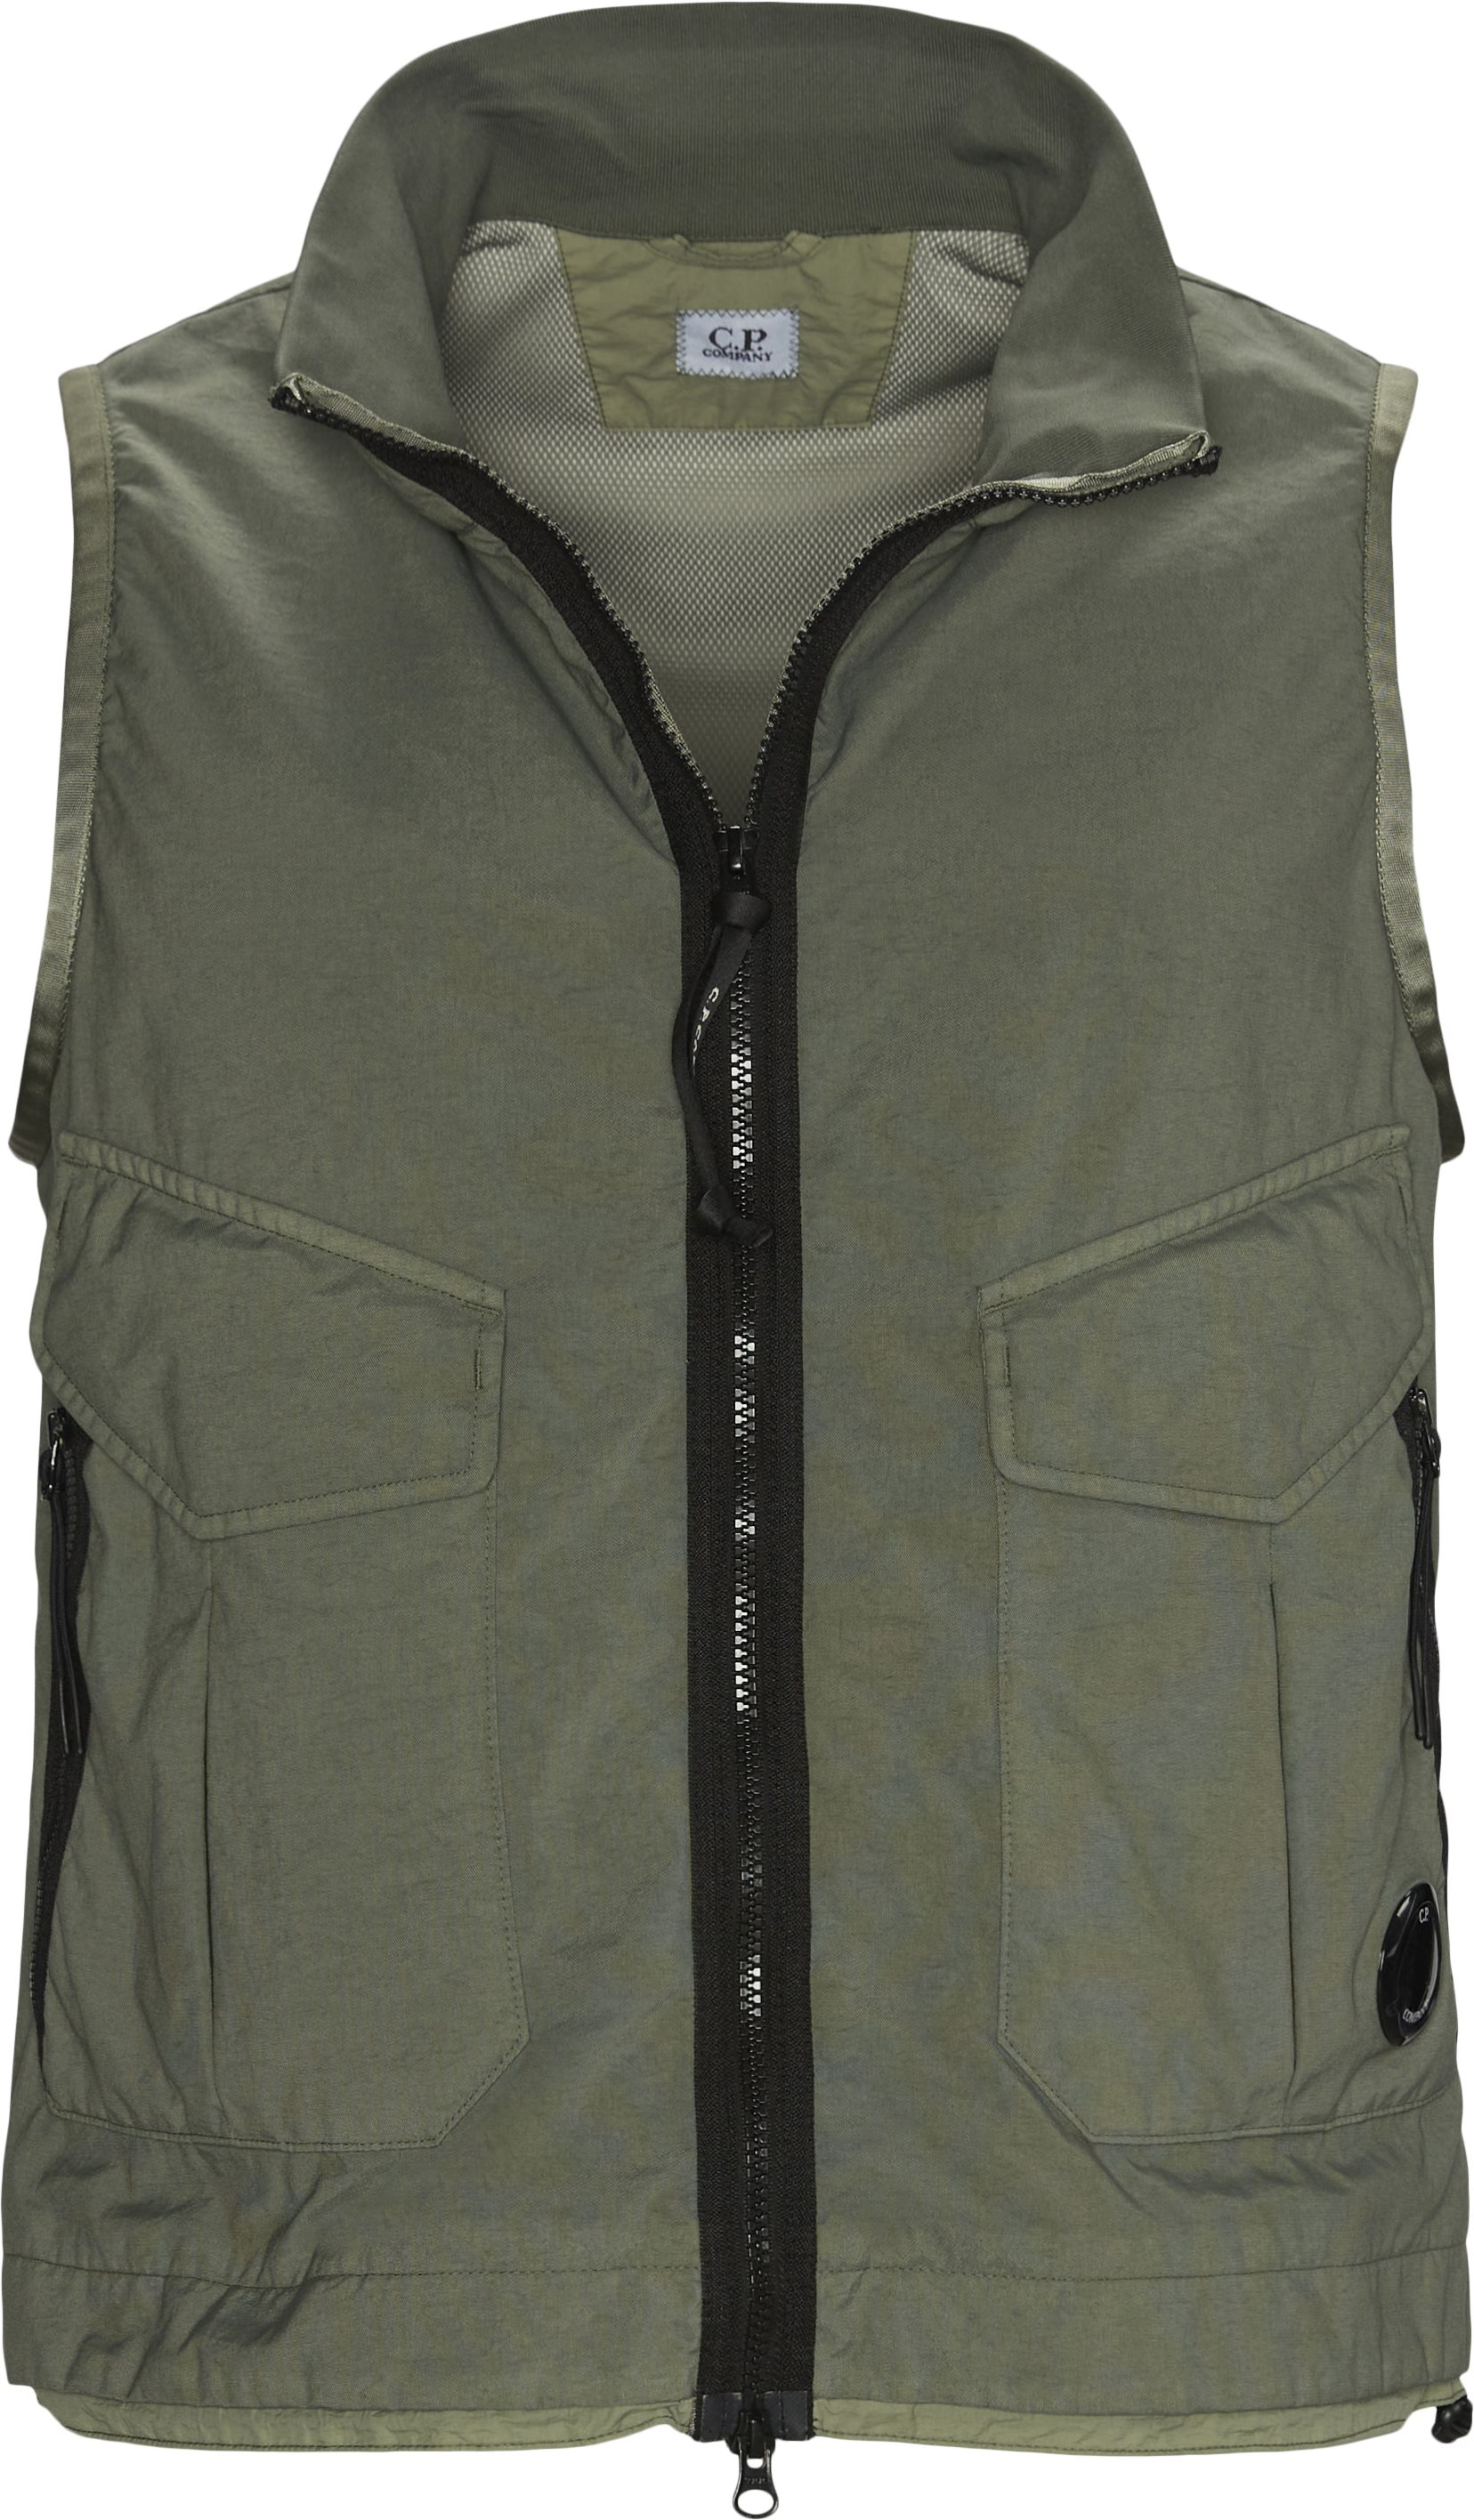 Taylon P Vest - Veste - Regular fit - Army